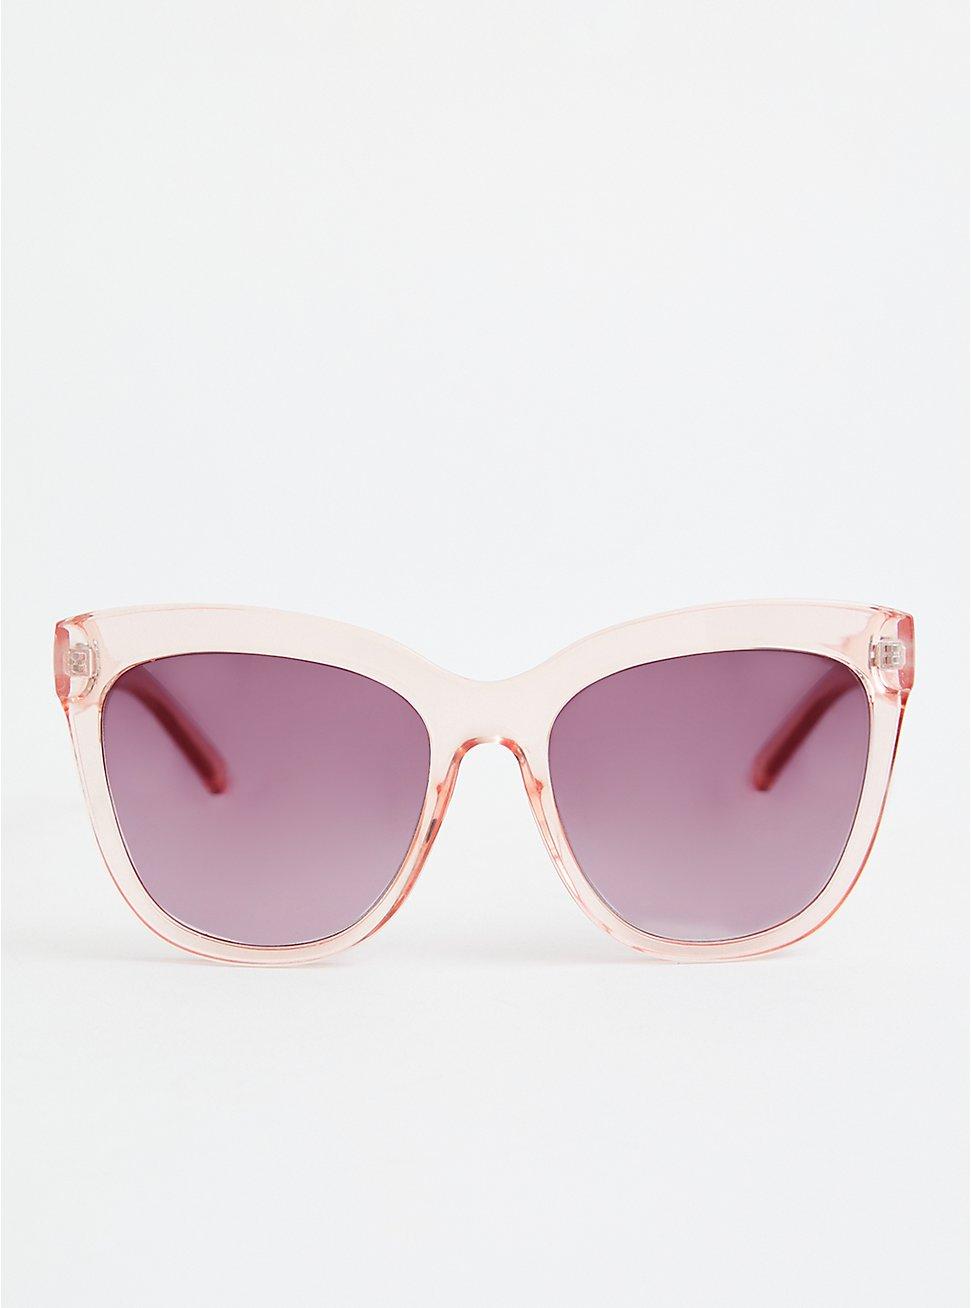 Pink Cat Eye Sunglasses, , hi-res